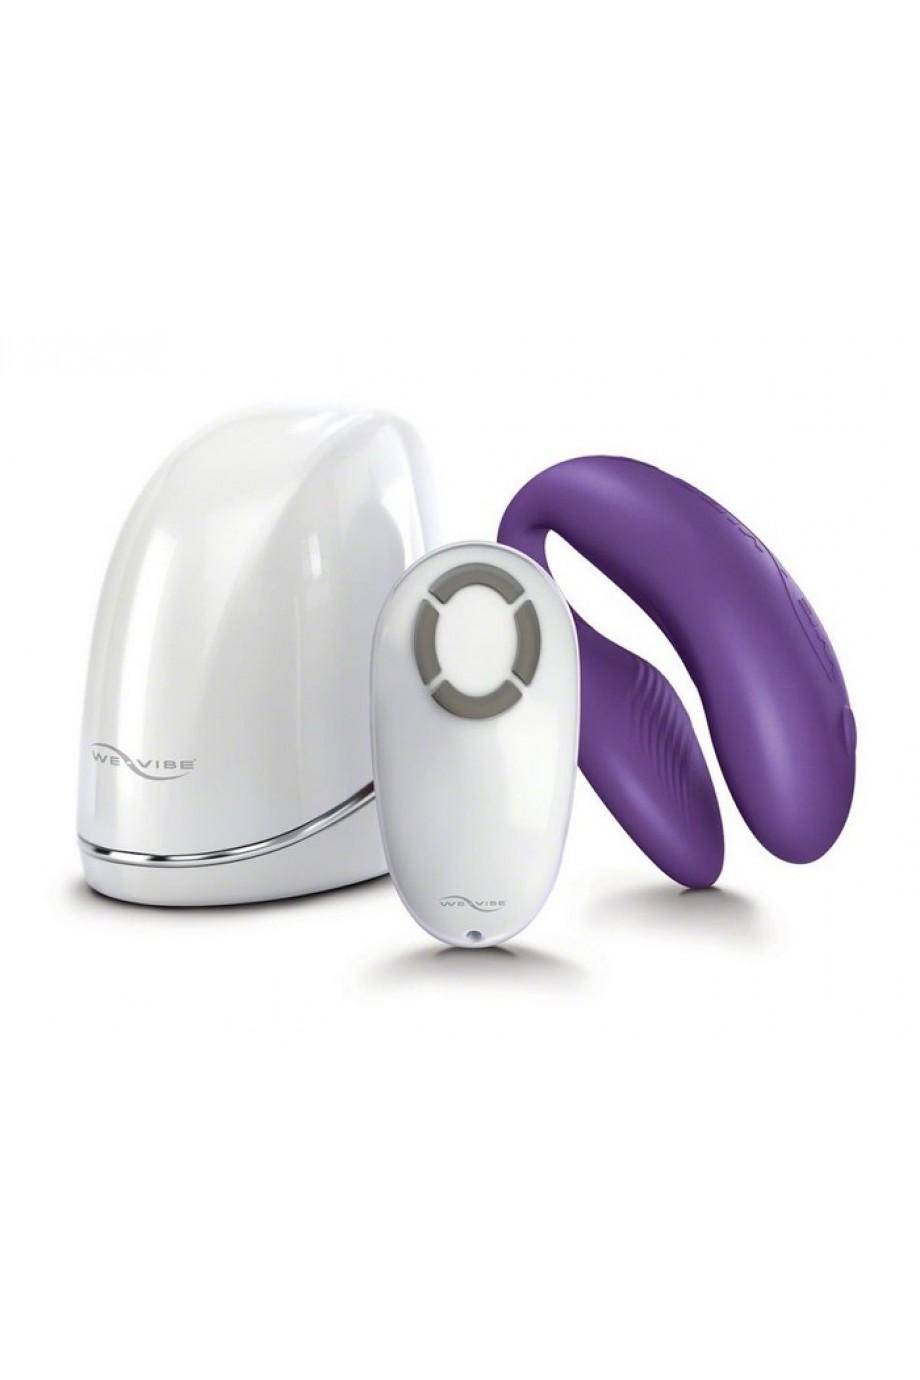 Вибратор для пар WE-Vibe 4 (вивайб), фиолетовый